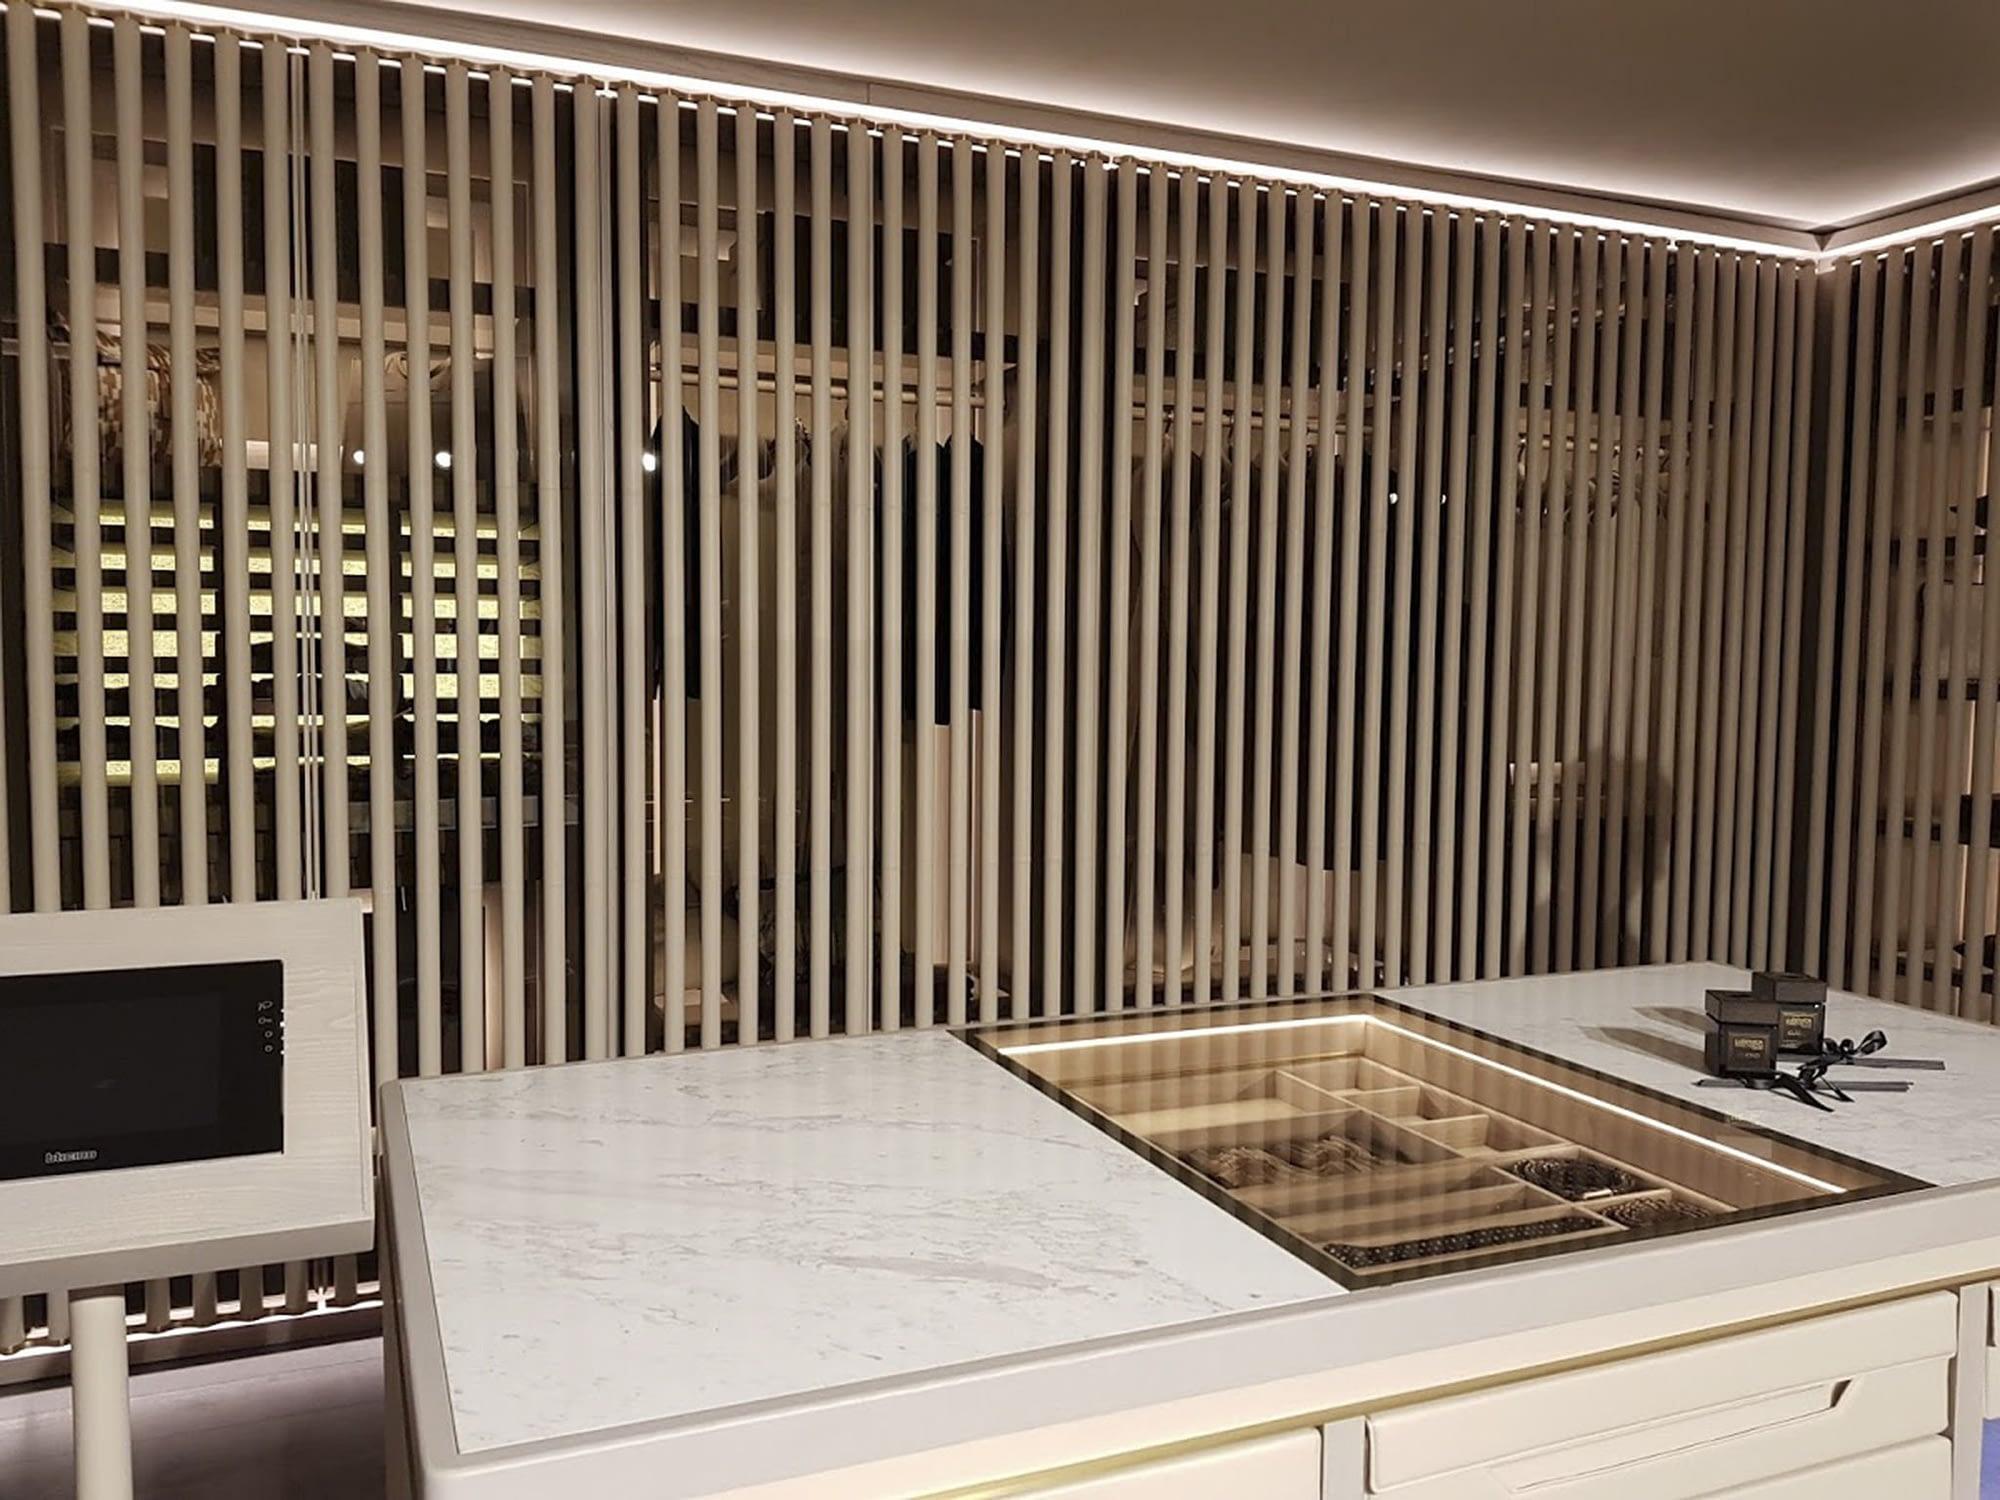 Milano Design Week 2018 - Salone del Mobile 31